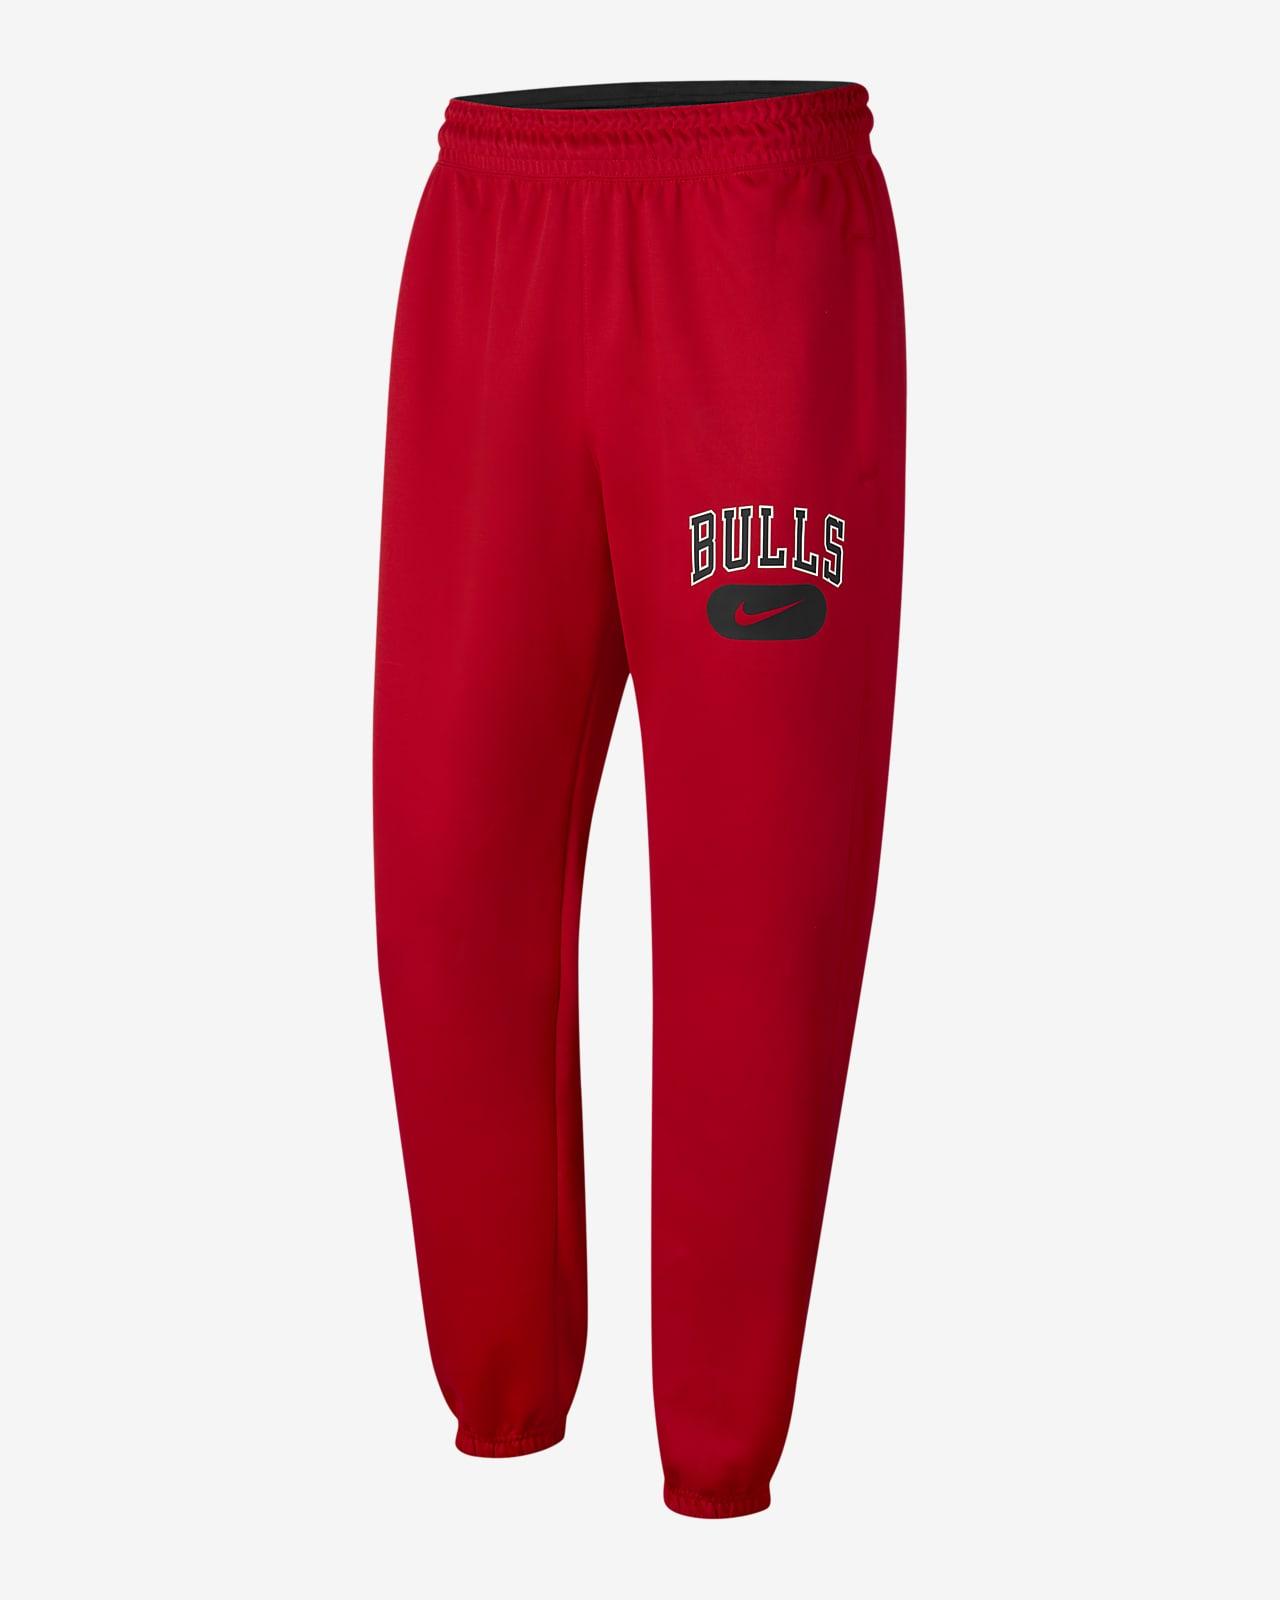 Chicago Bulls Spotlight Men's Nike Dri-FIT NBA Trousers